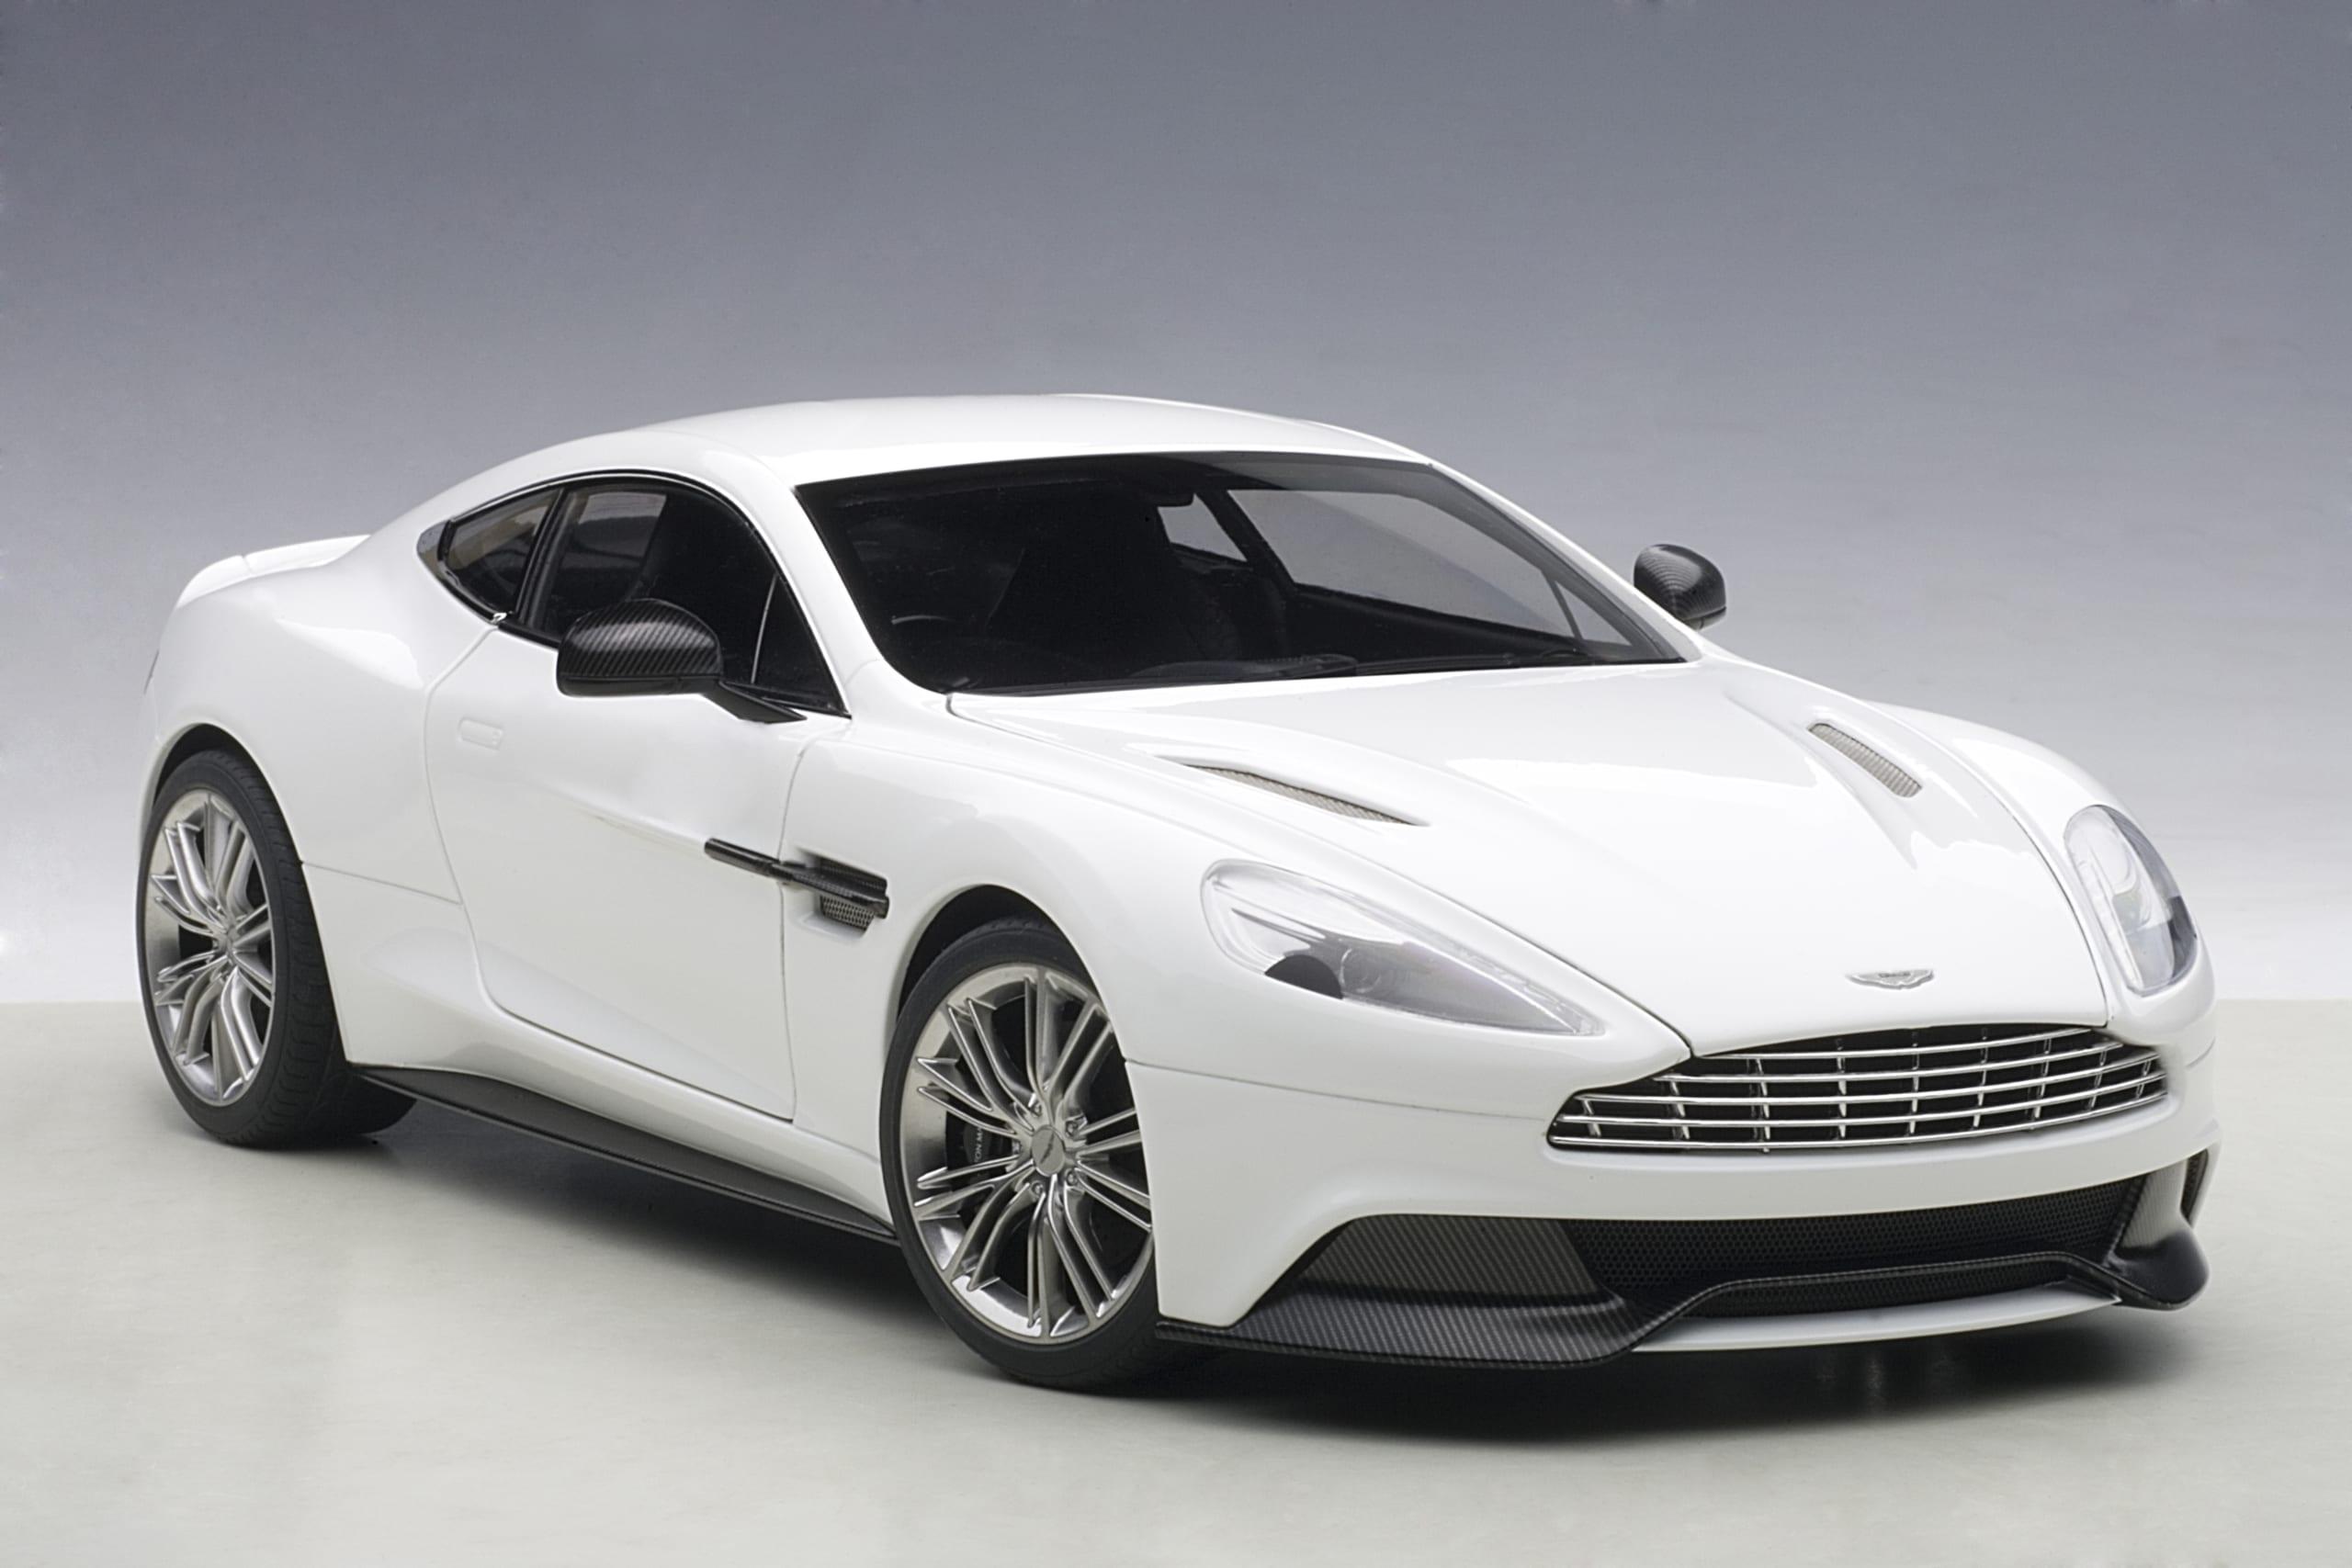 Aston Martin Vanquish 2015 White Autoart